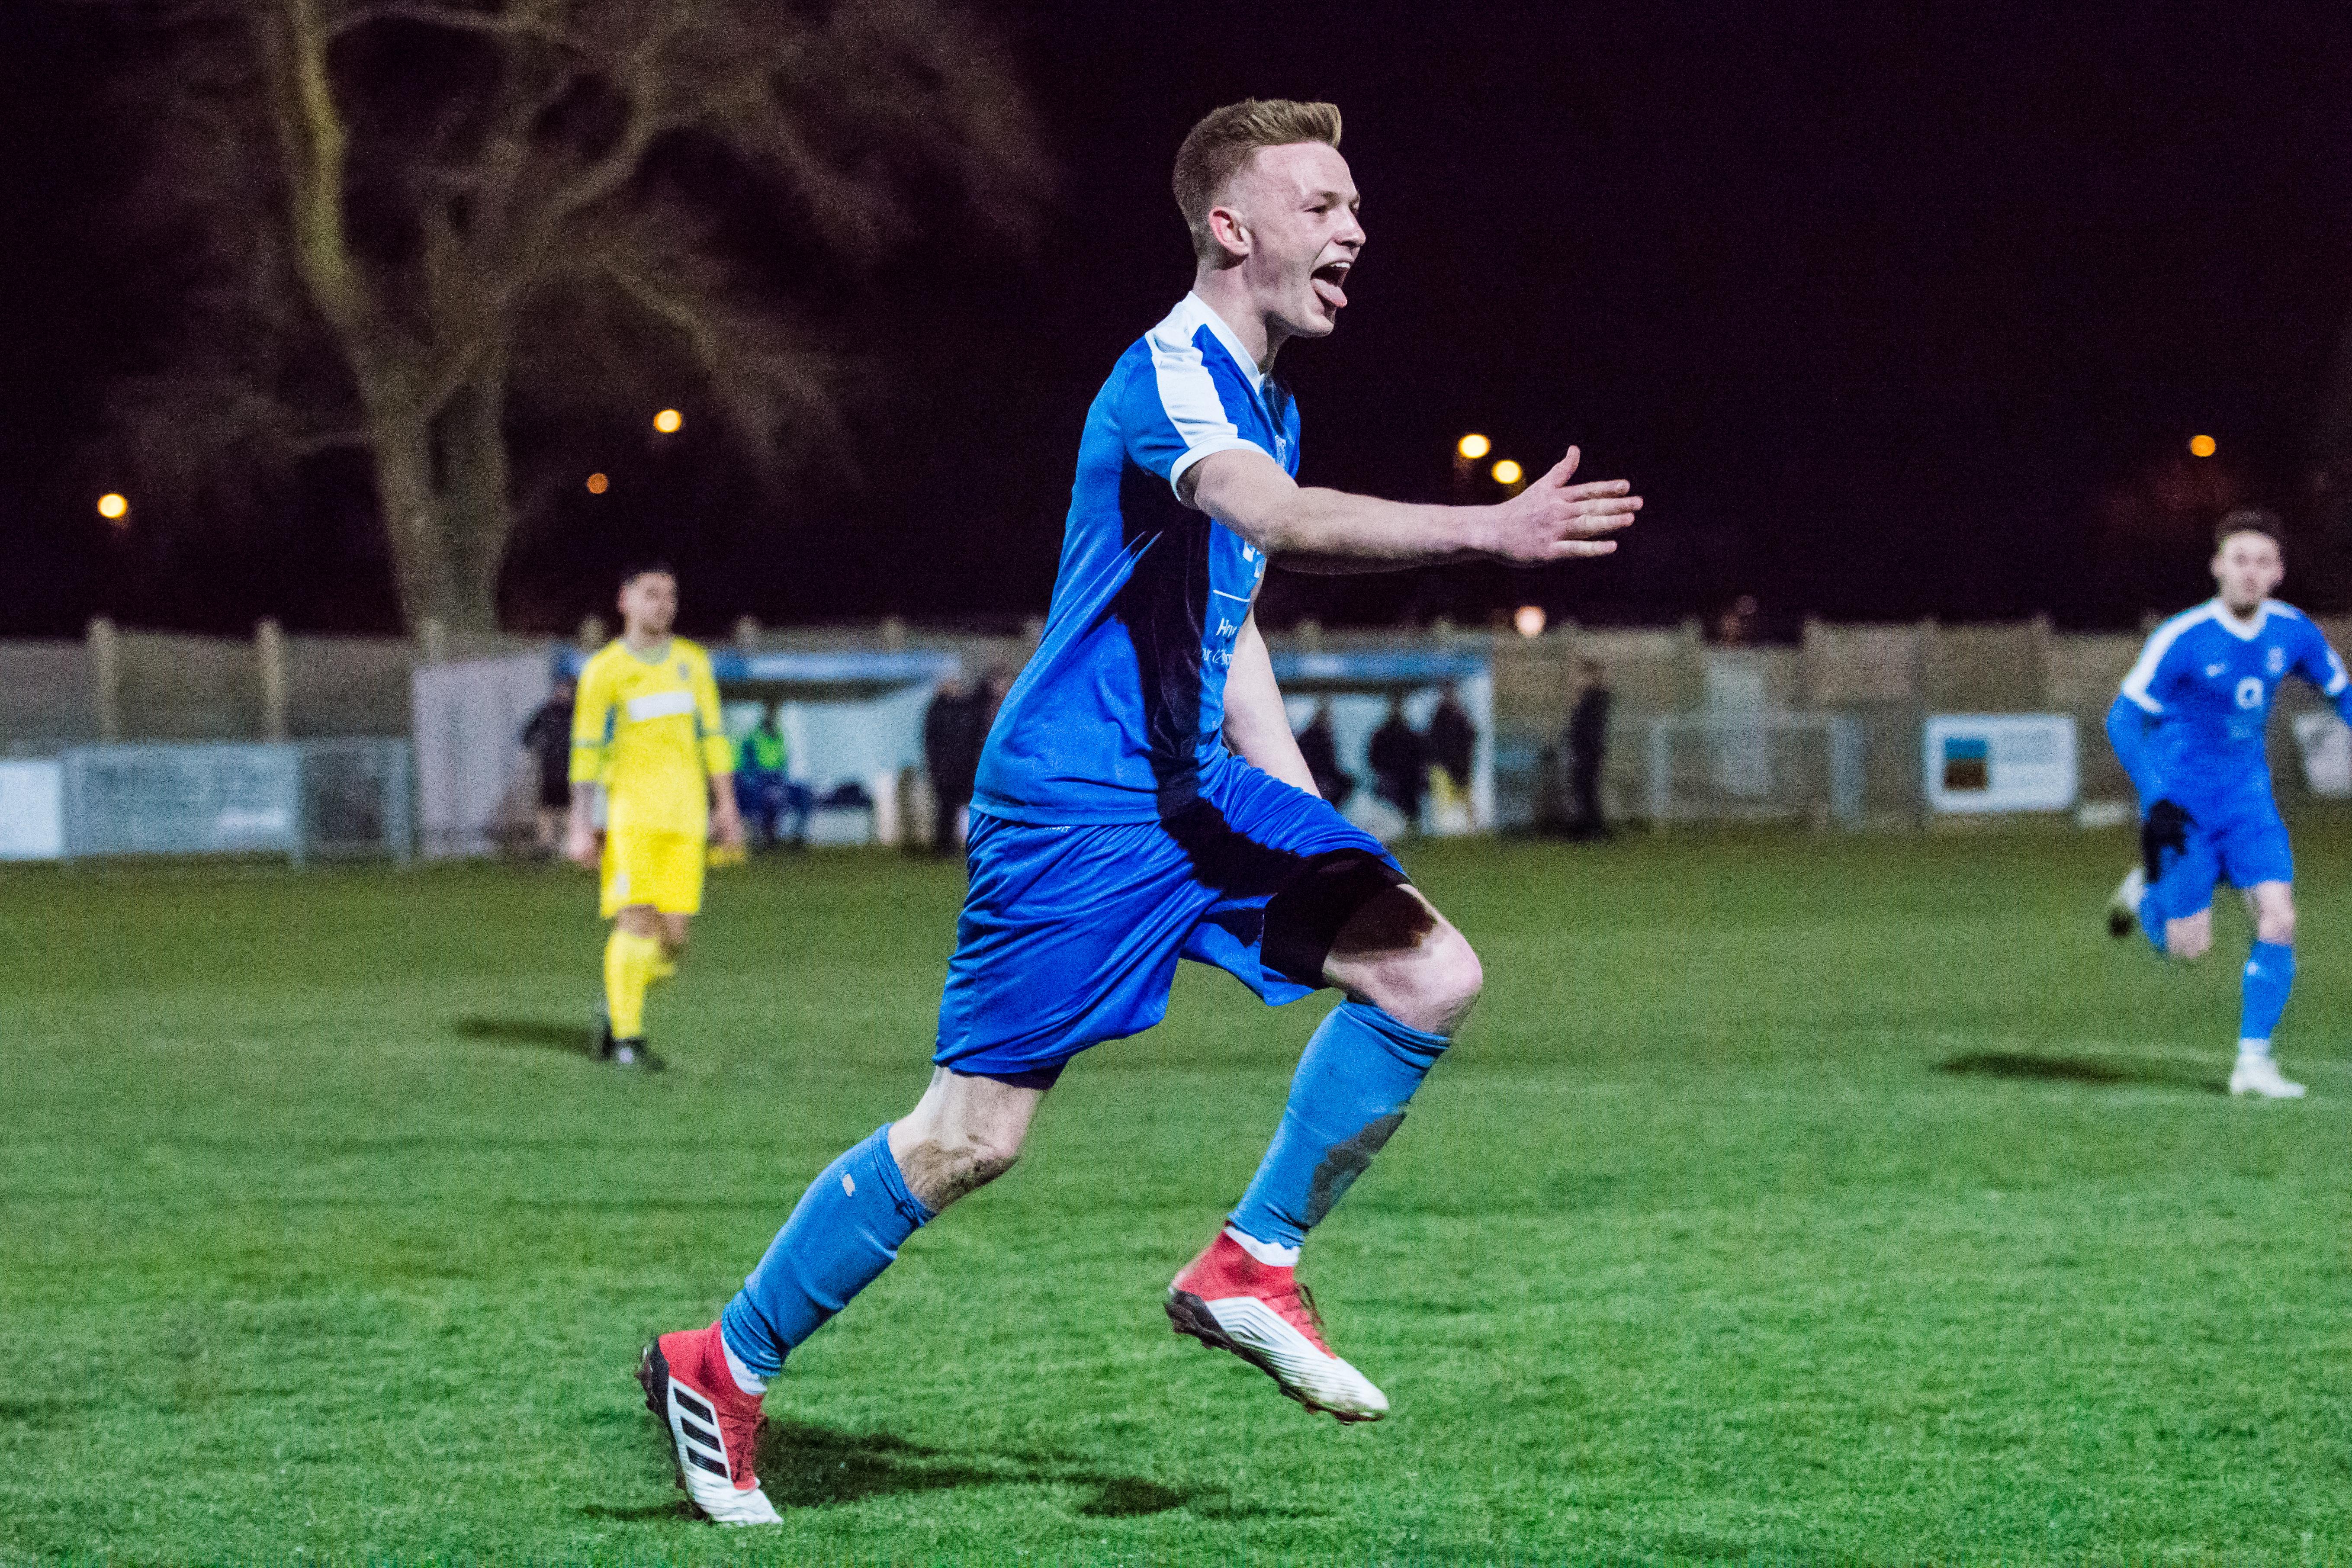 DAVID_JEFFERY Shoreham FC U18s vs Woking FC Academy 22.03.18 43